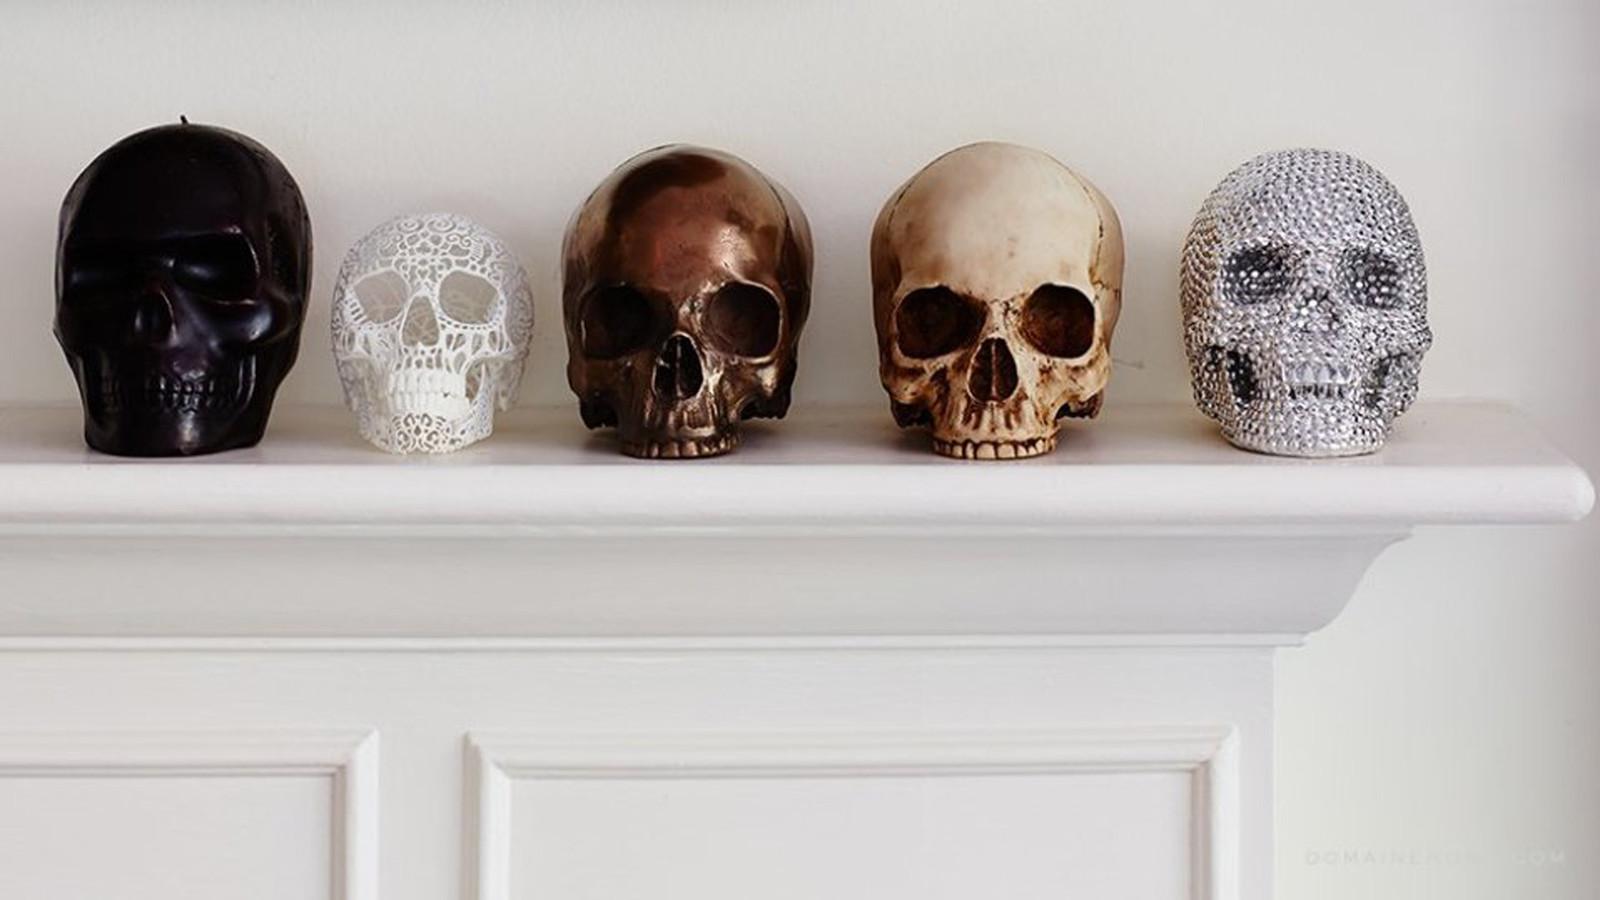 Skull mantelpiece matt black gold Halloween